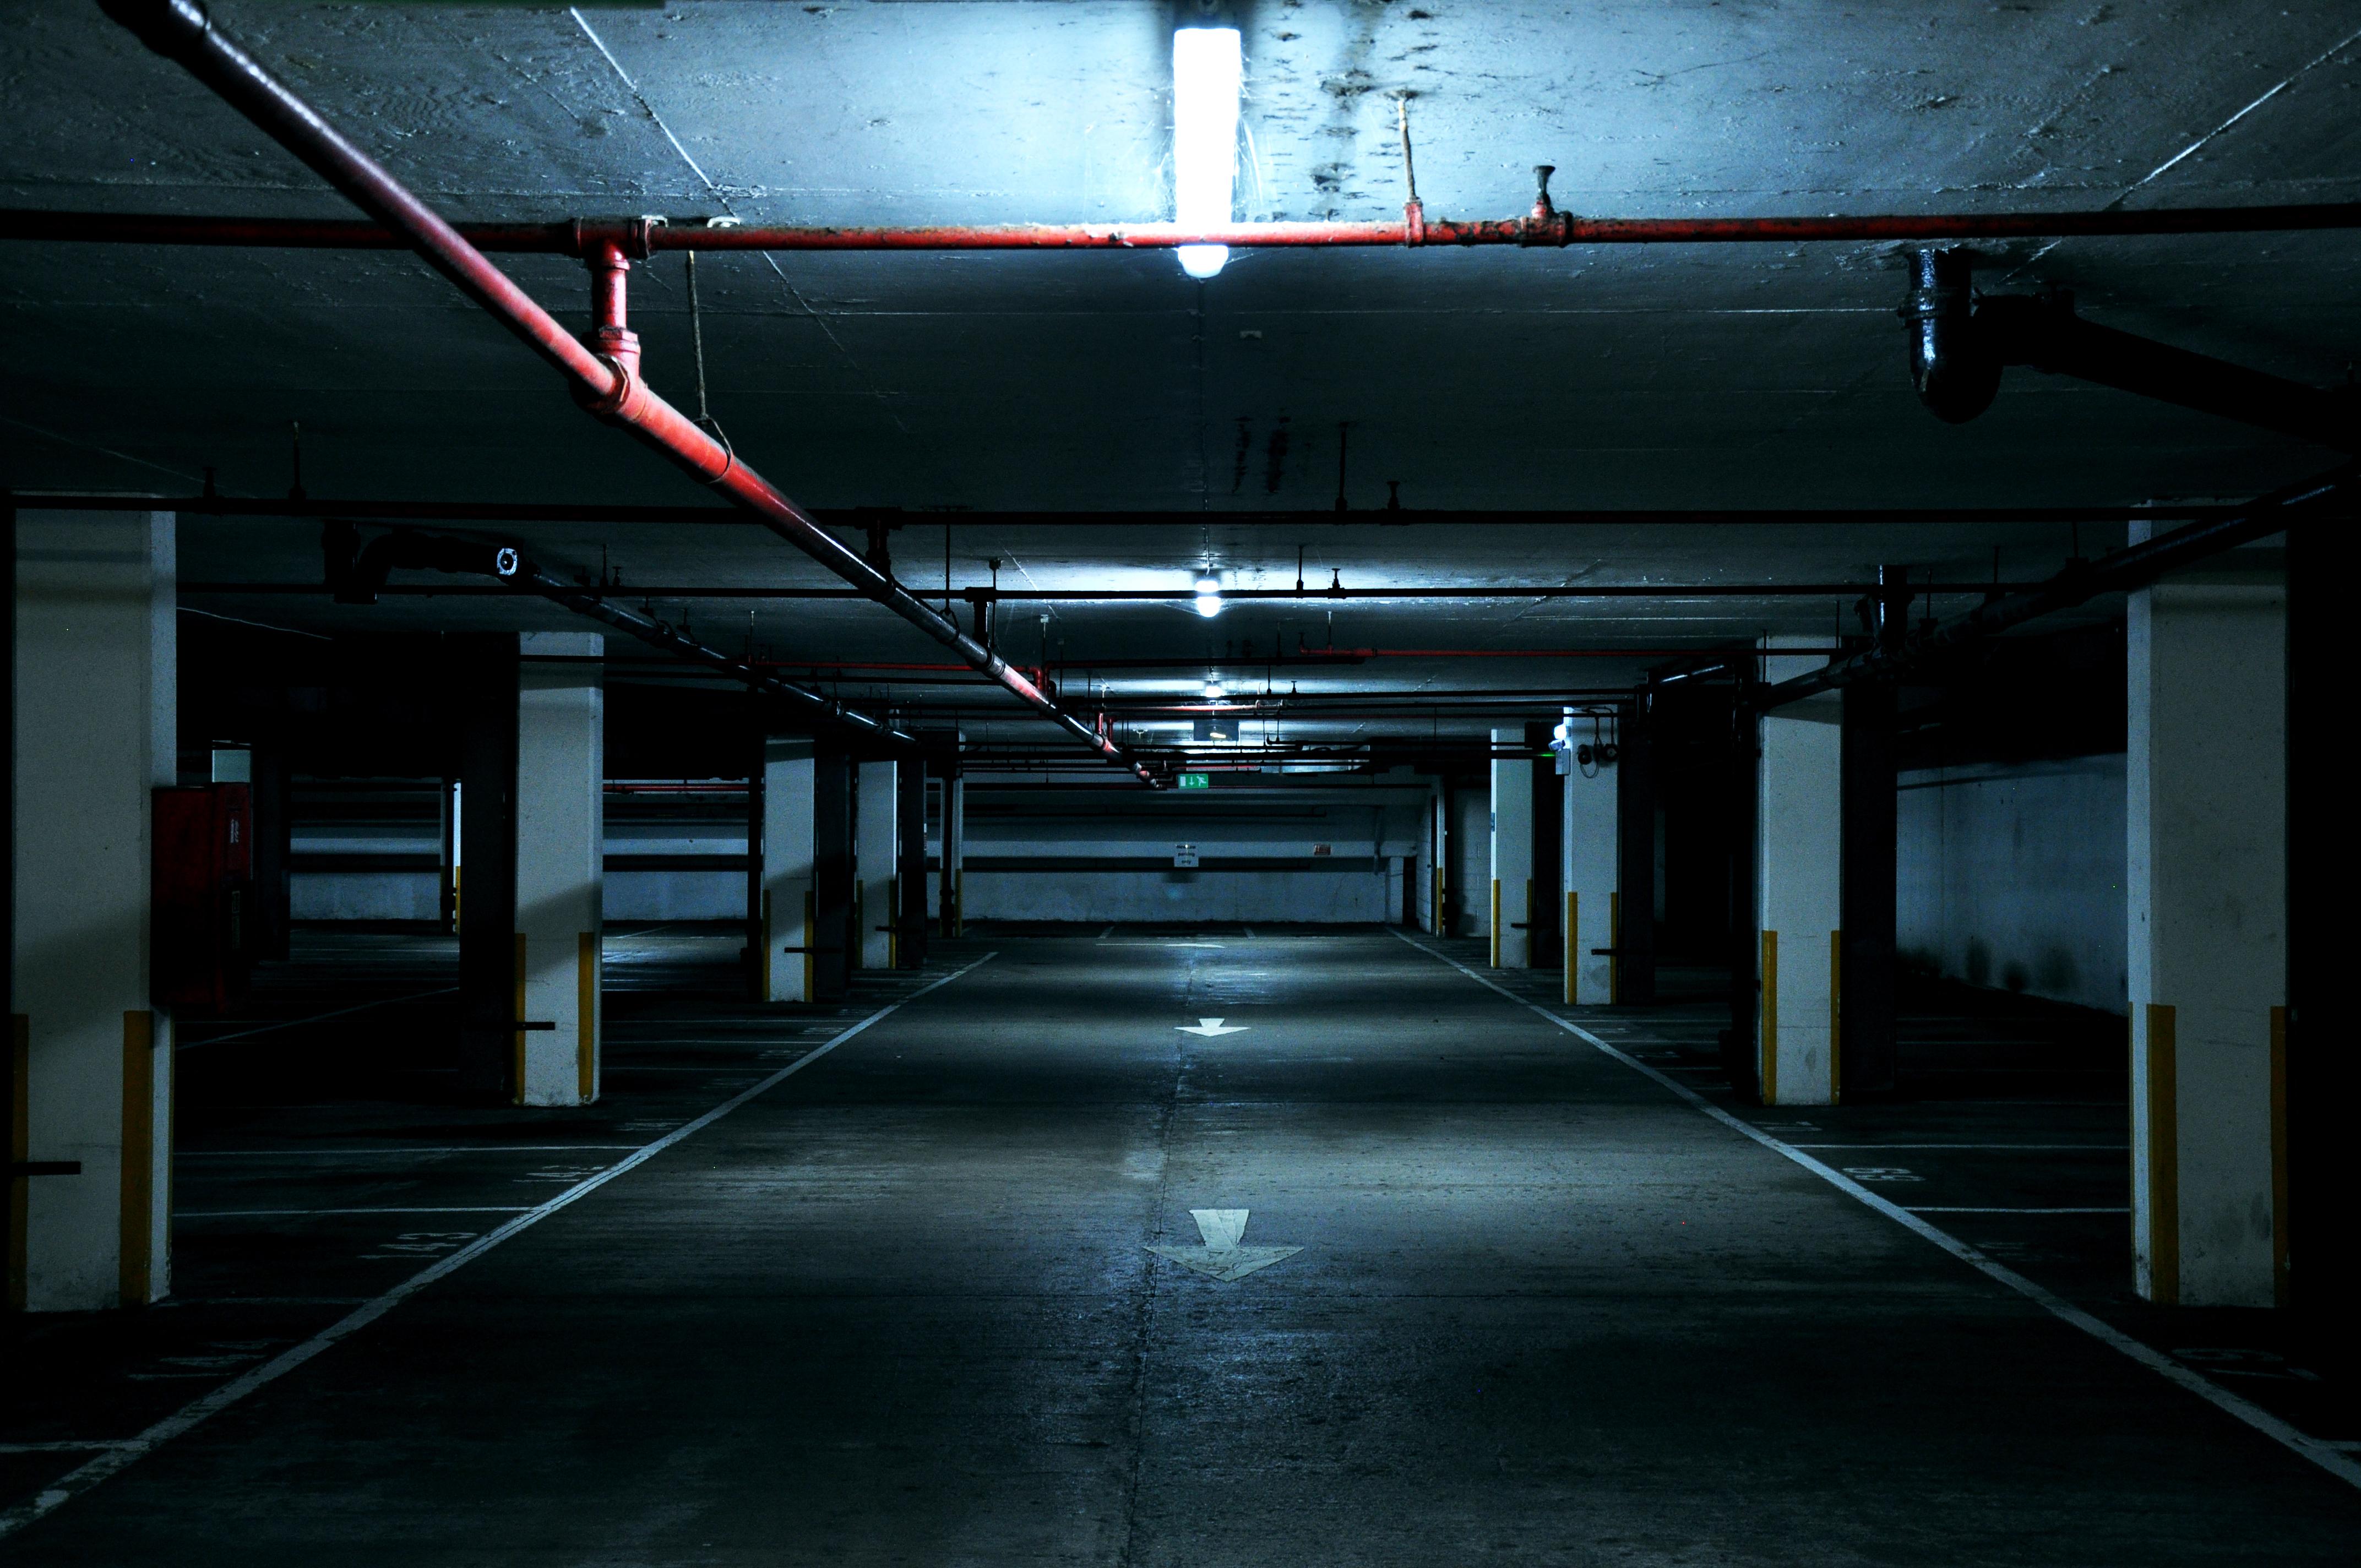 photo source https://unsplash.com/search/parking-garage?photo=1JcEl81di6Y